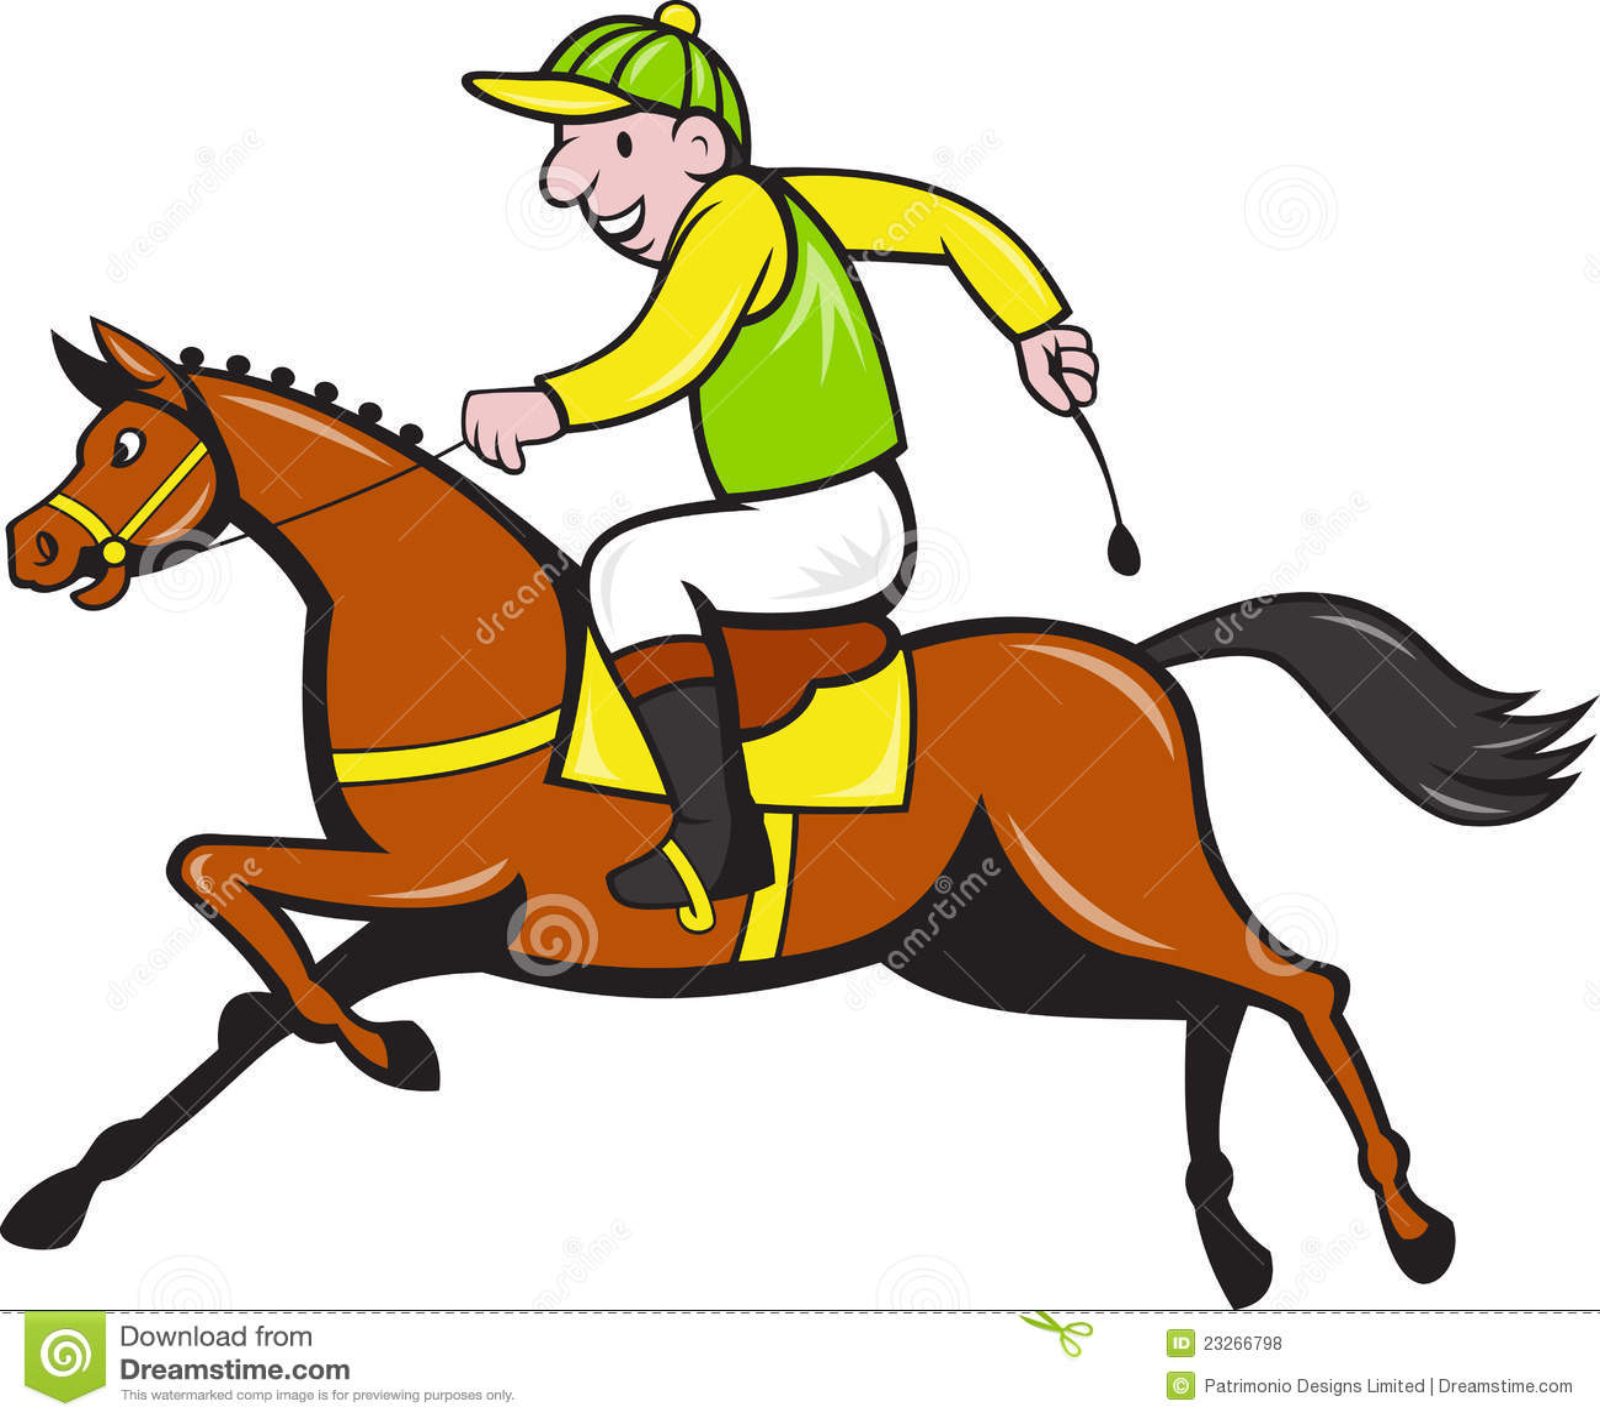 Cartoon Jockey And Horse Racing Side Illustration Of A Equestrian